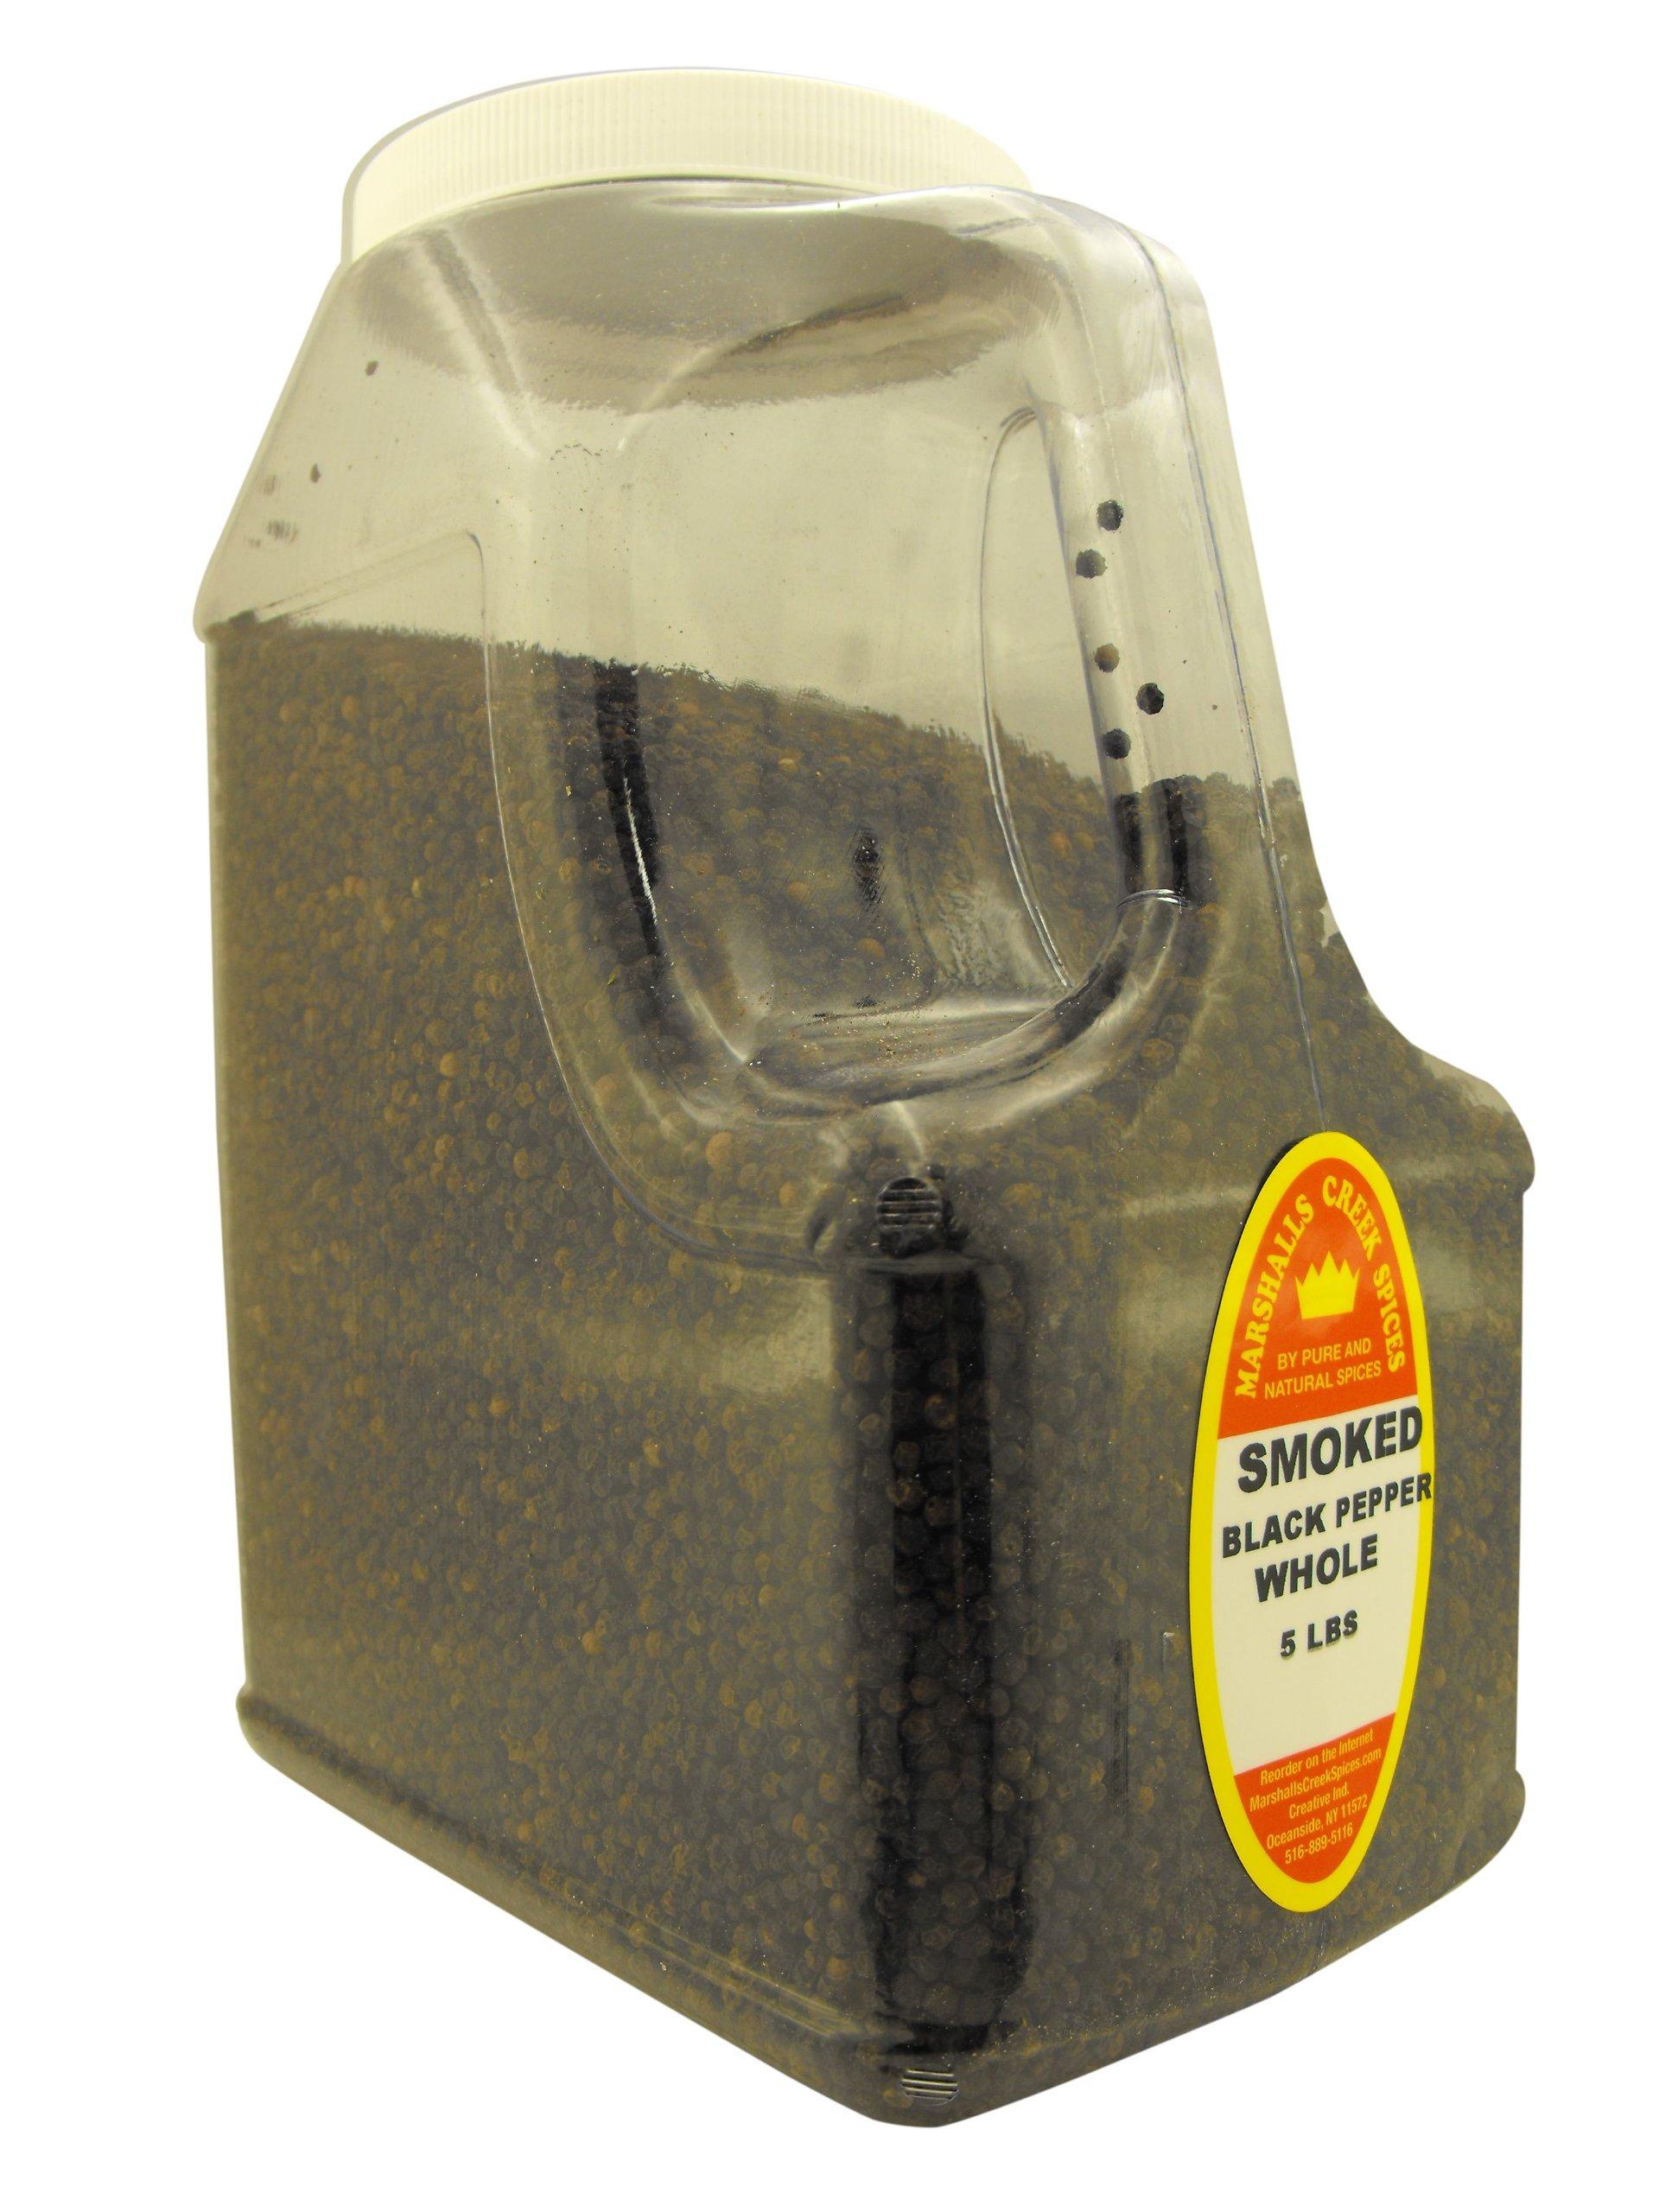 SMOKED BLACK PEPPER WHOLE 5 LB. RESTAURANT SIZE JUG